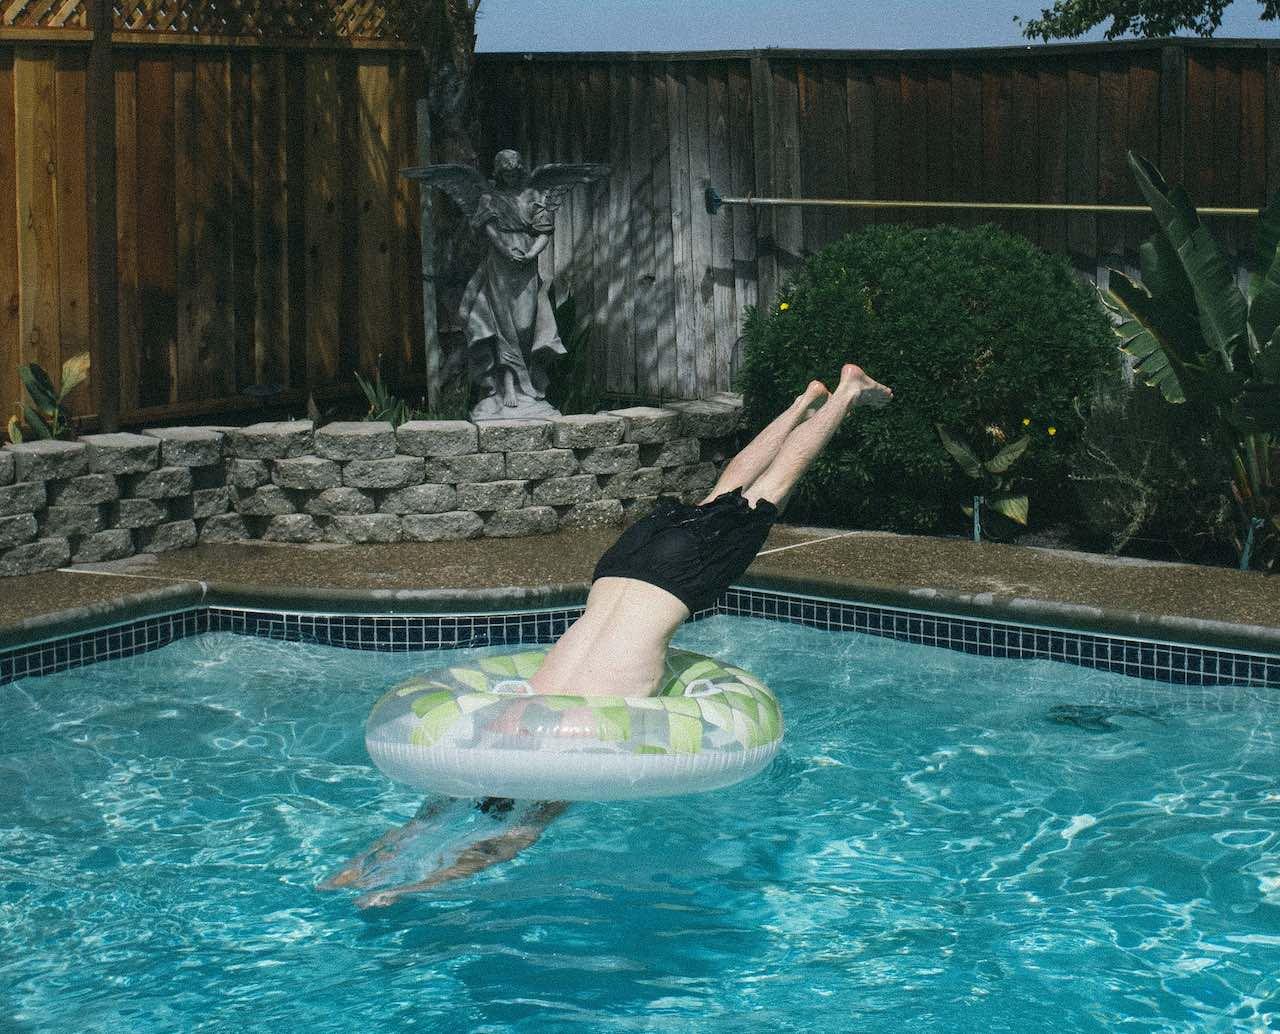 Man in a pool Myrtle Beach